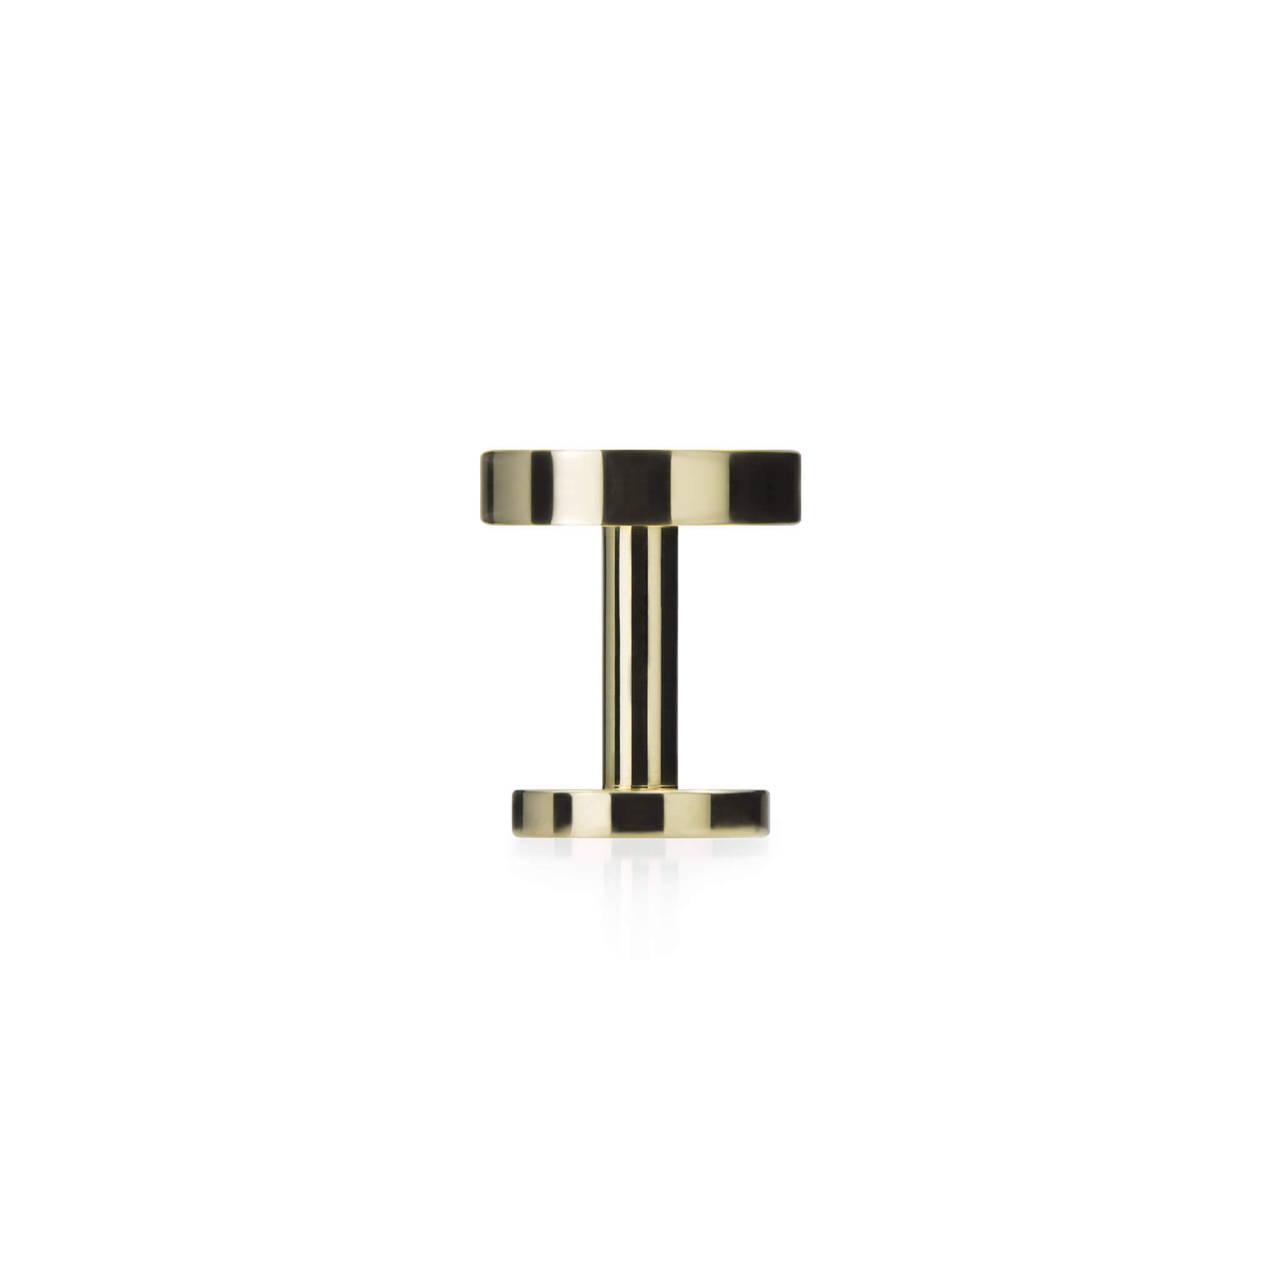 Polished Brass Cufflink